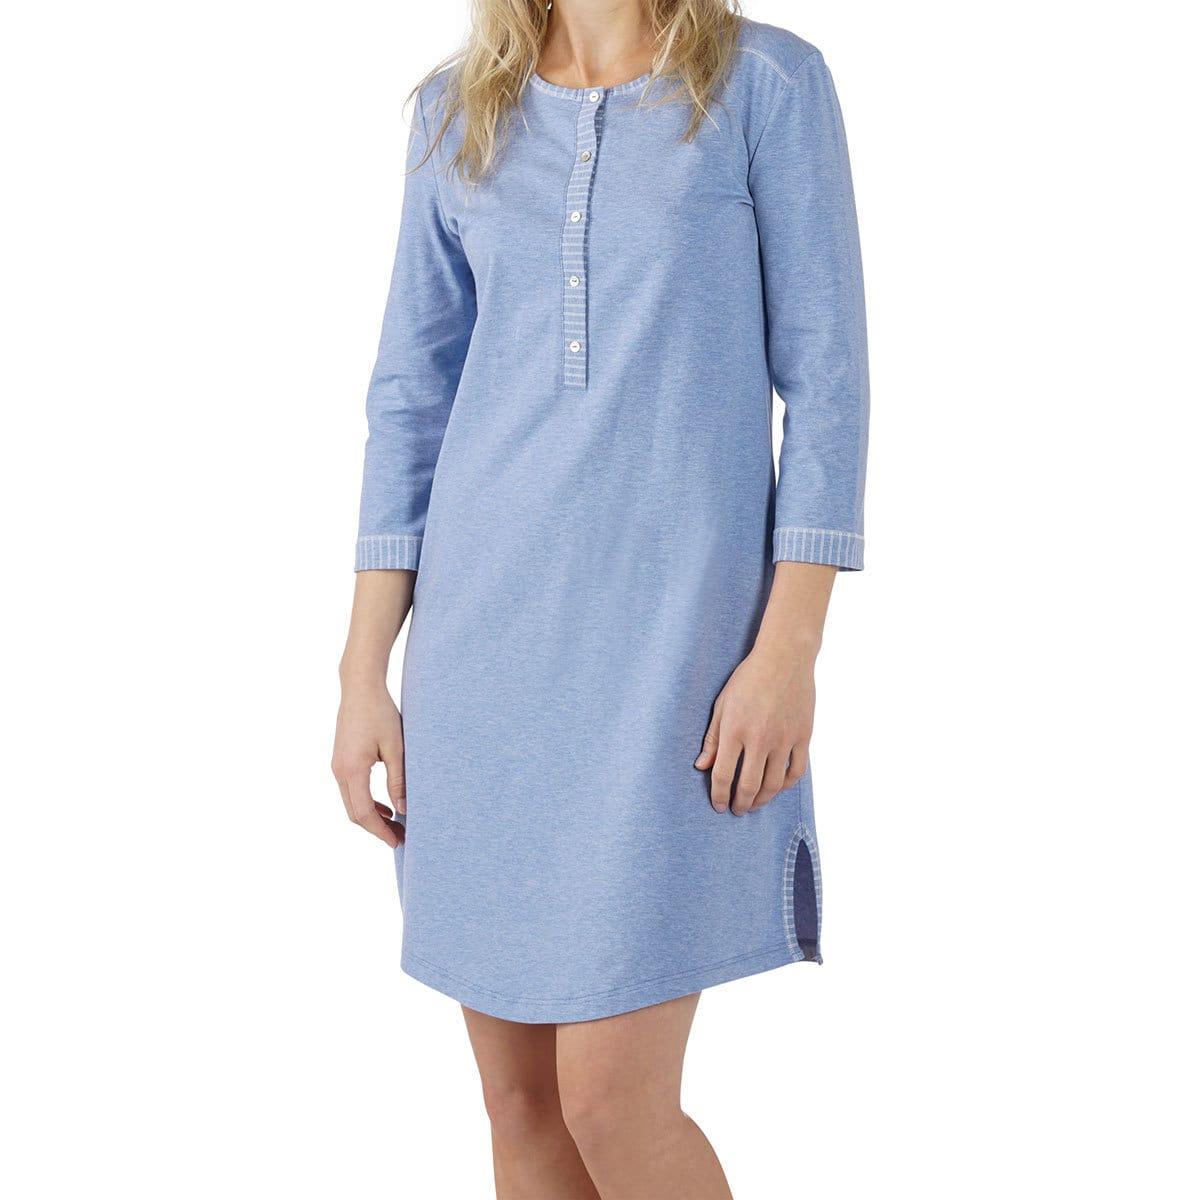 7a07f83e1183eb Comazo Earth Damen Nachthemd jeans günstig online kaufen bei ...